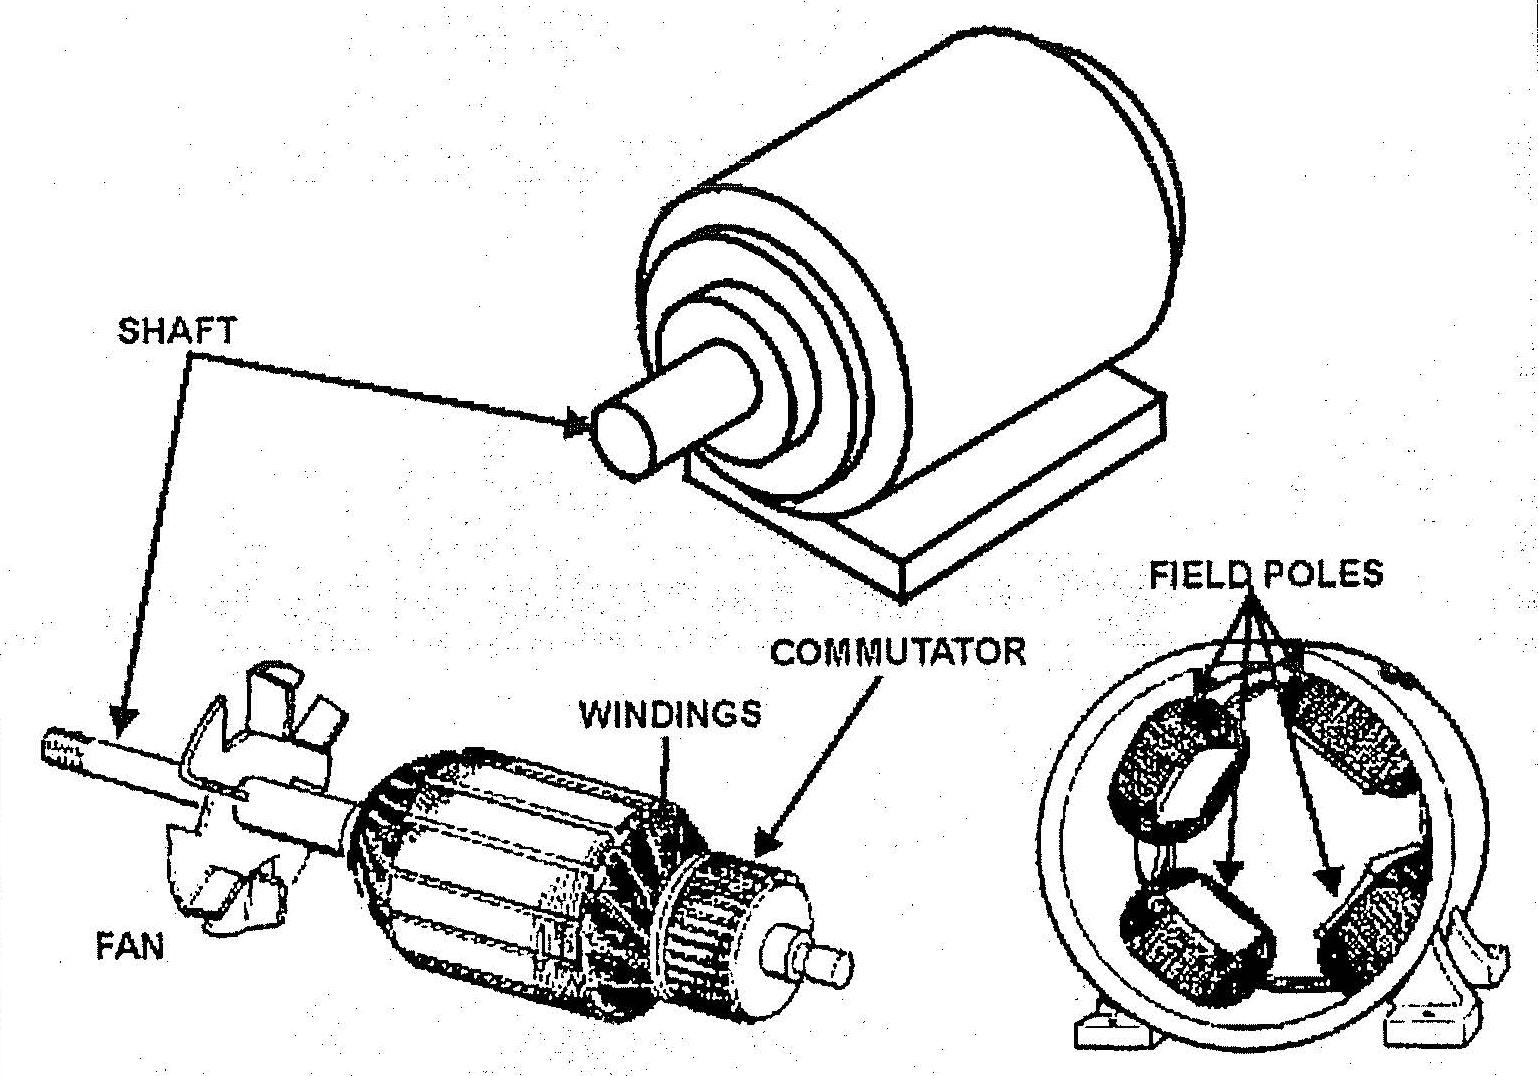 [DIAGRAM GA_1869] Dc Motor Electrical Diagram HD Quality